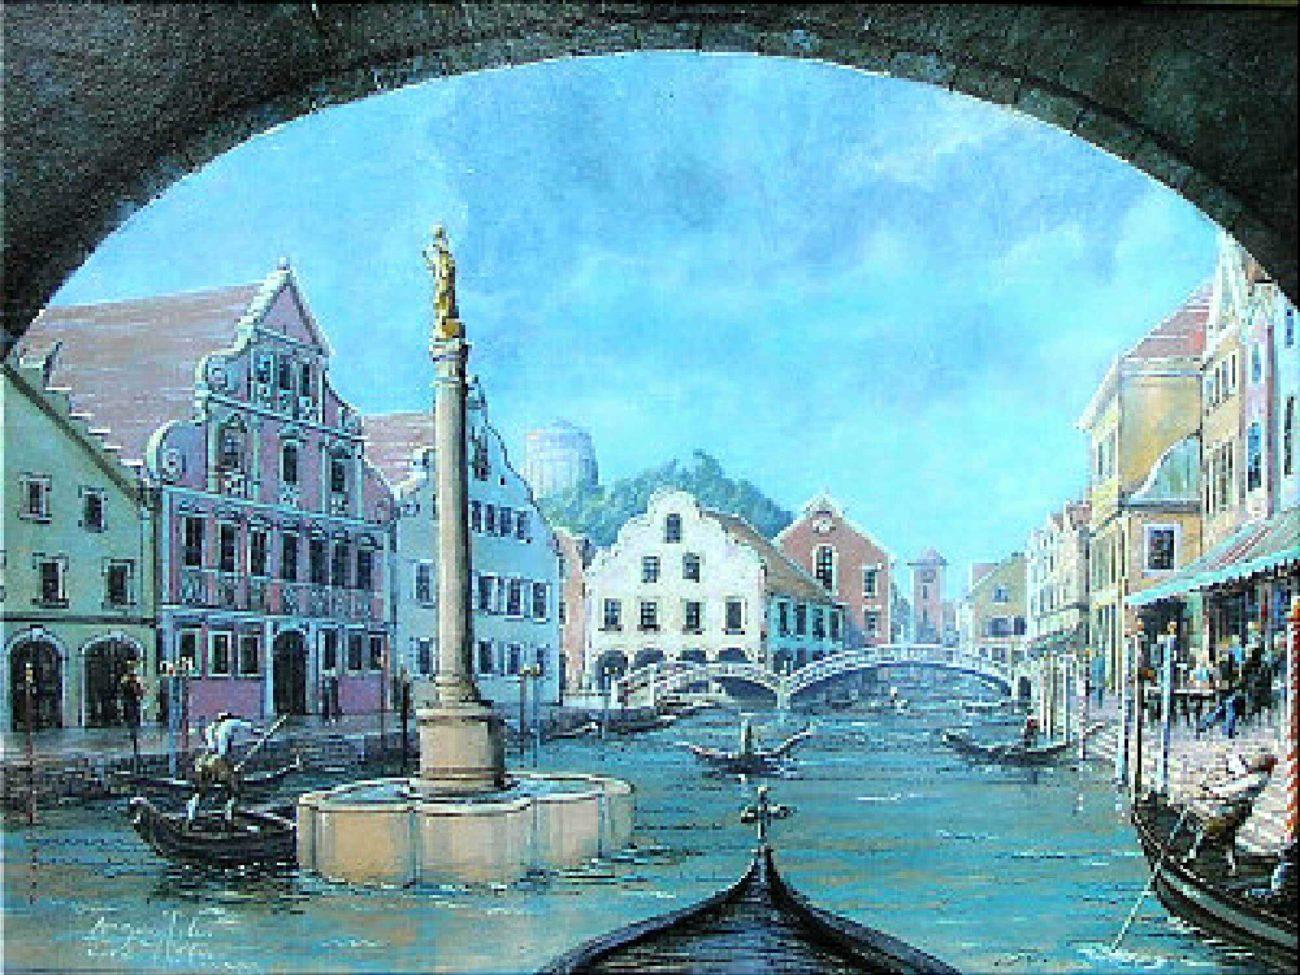 Canale Grande in Kelheim